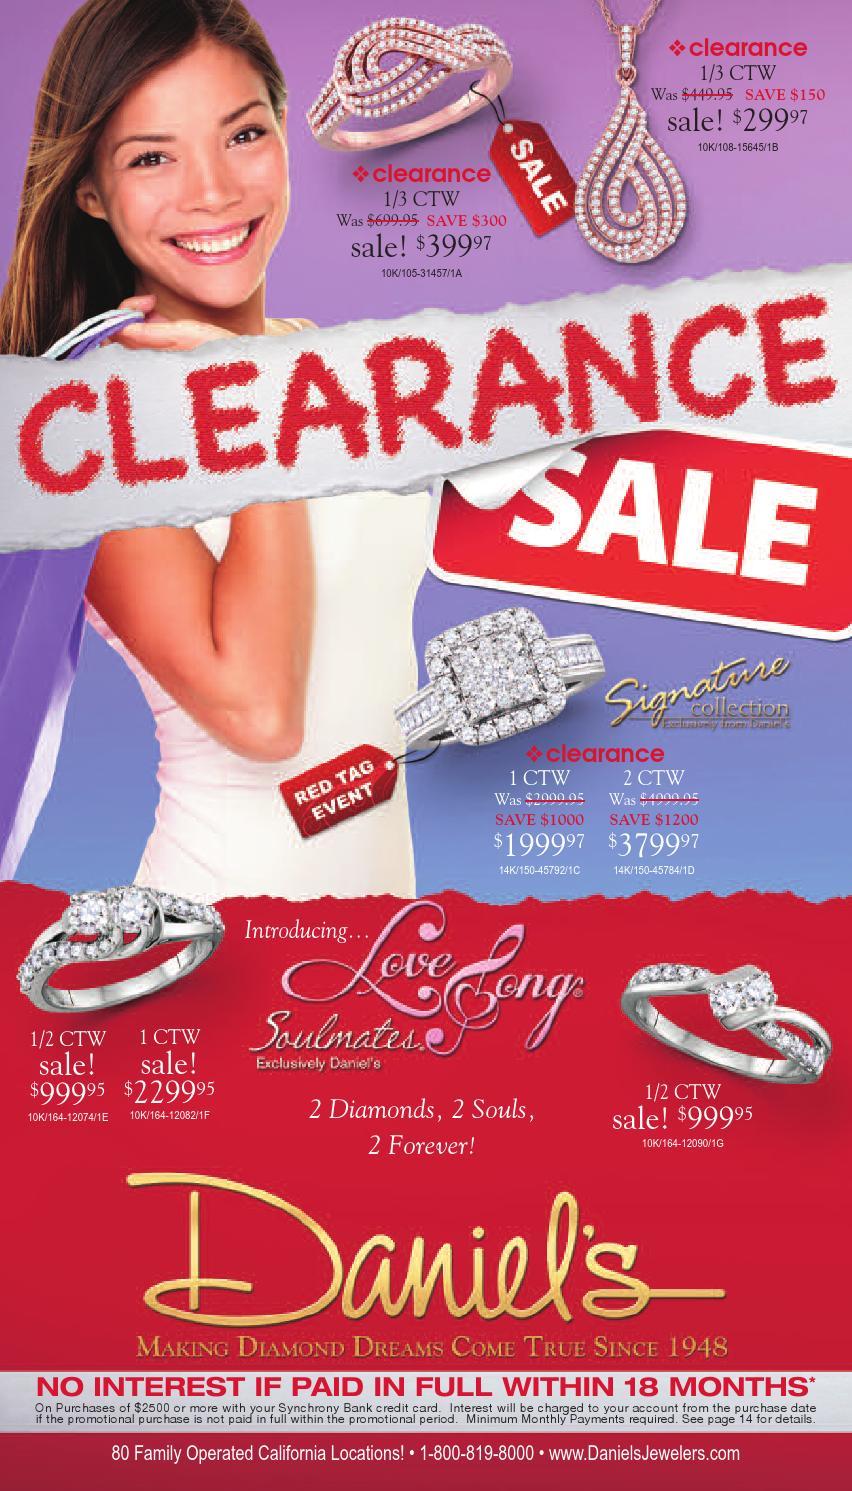 Daniels Jewelry Payment : daniels, jewelry, payment, Daniel's, Jewelers, Clearance, Catalog, Issuu